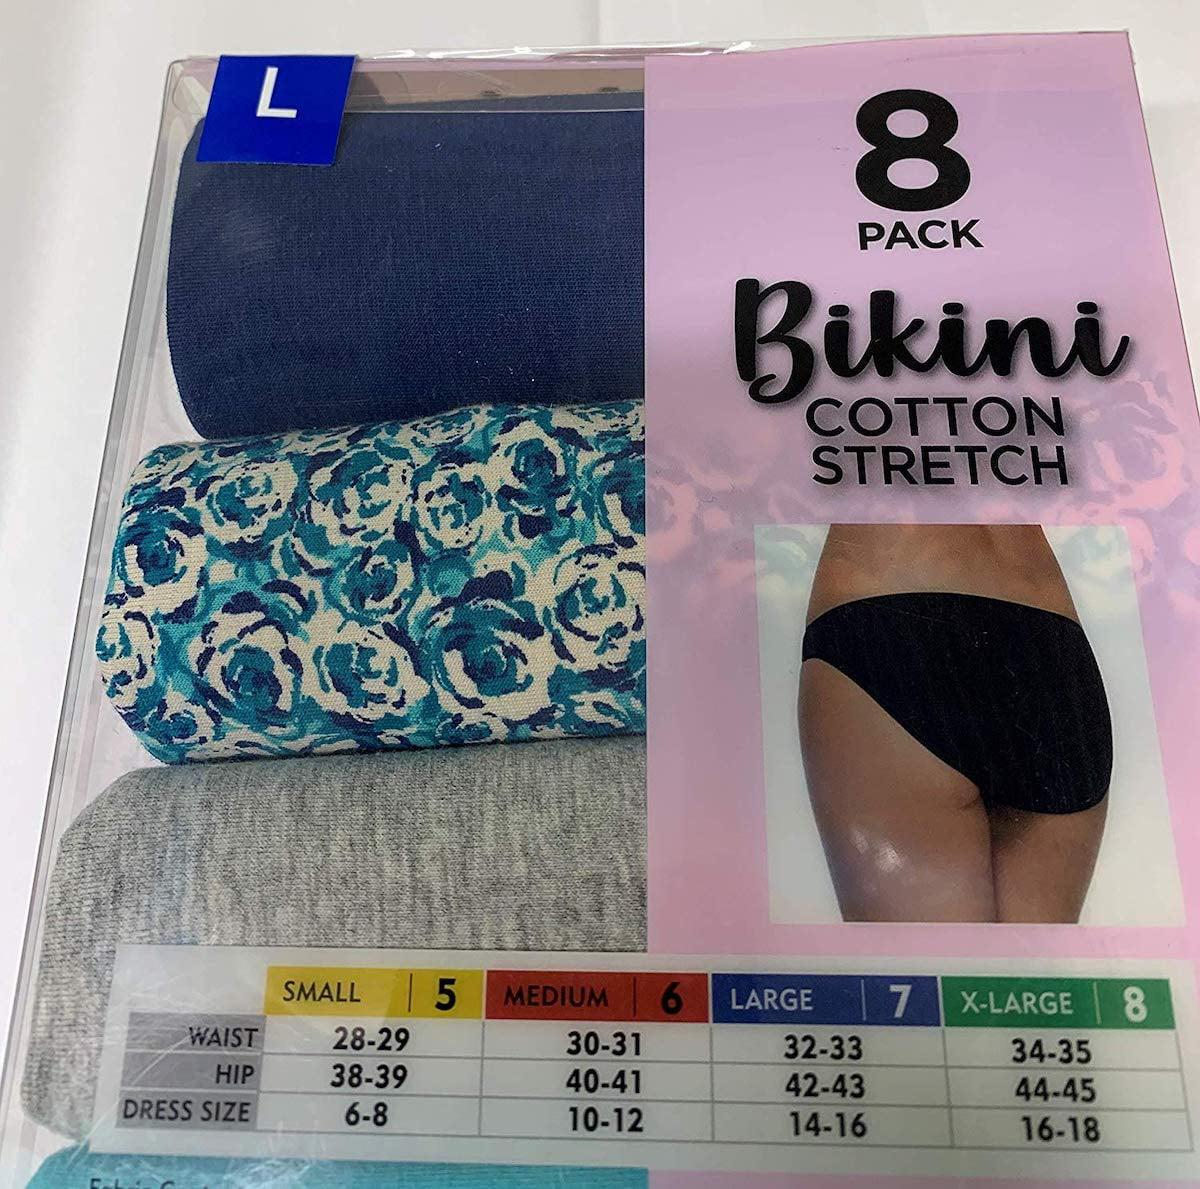 Black Bow 8 Pack Bikini Cotton Stretch Panties